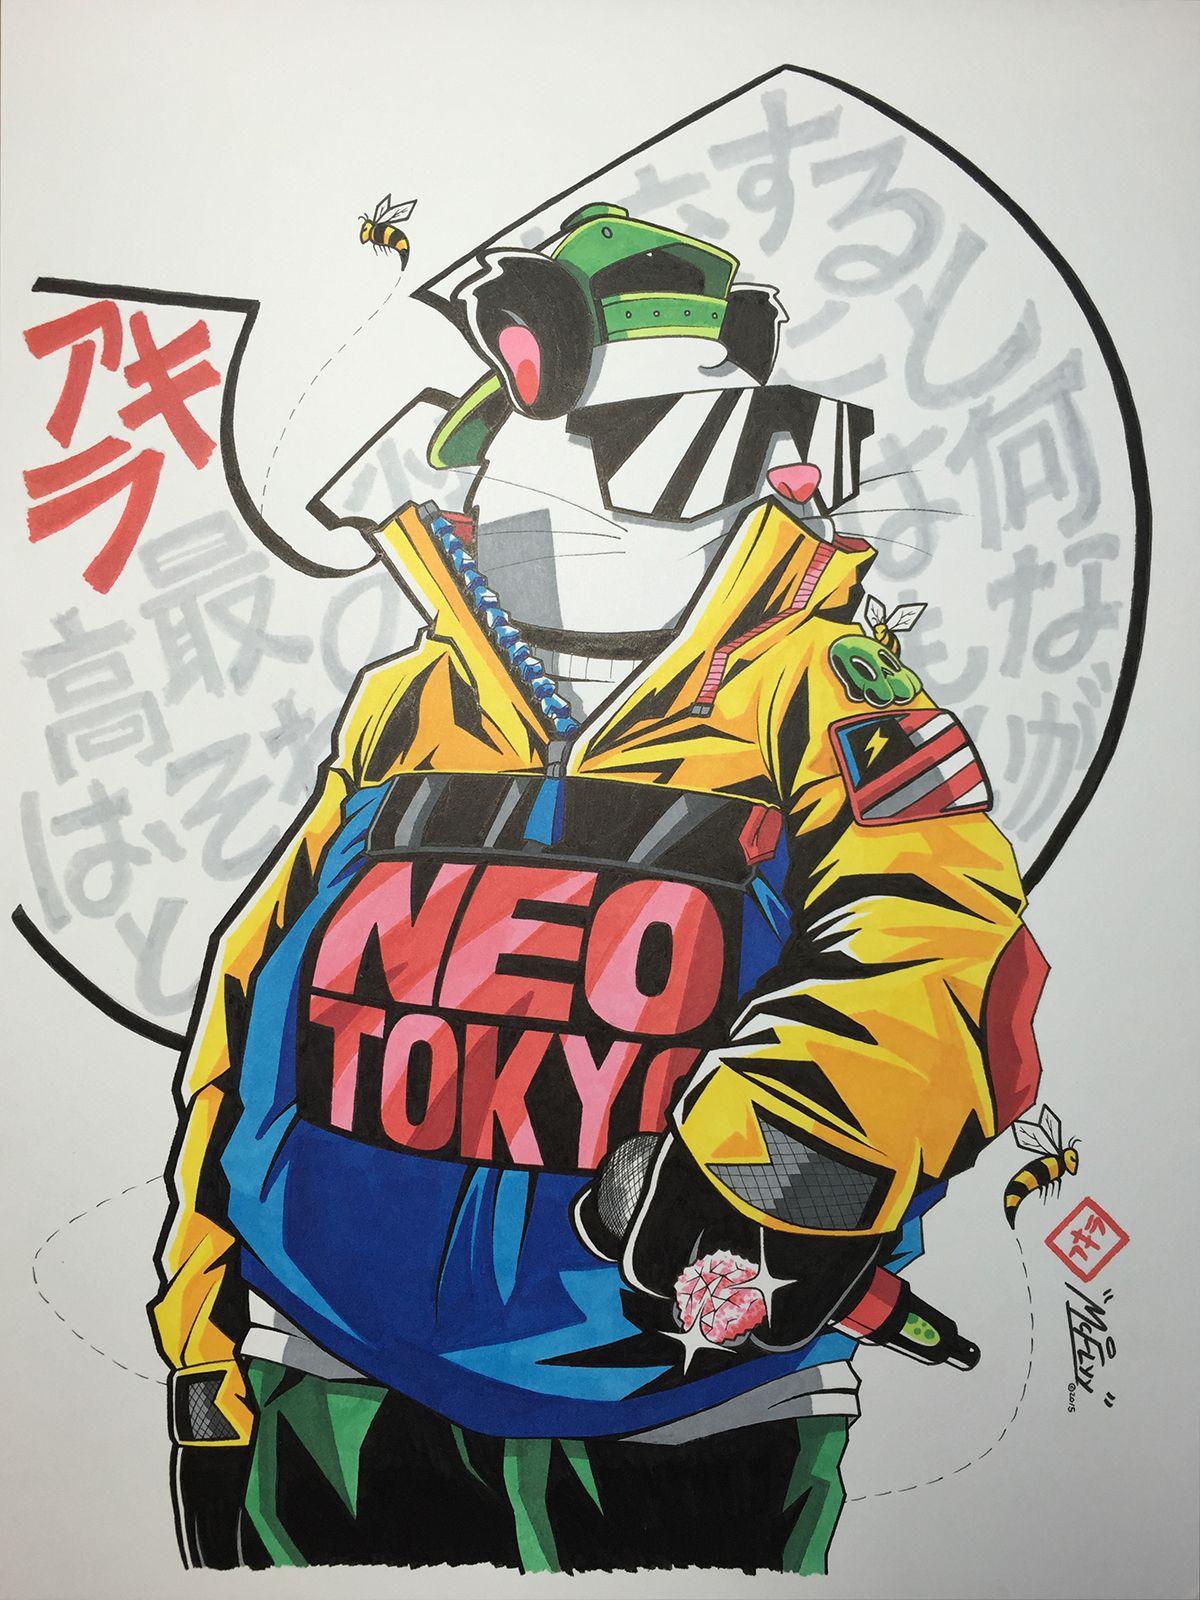 Akira Supreme by McFlyy on Behance